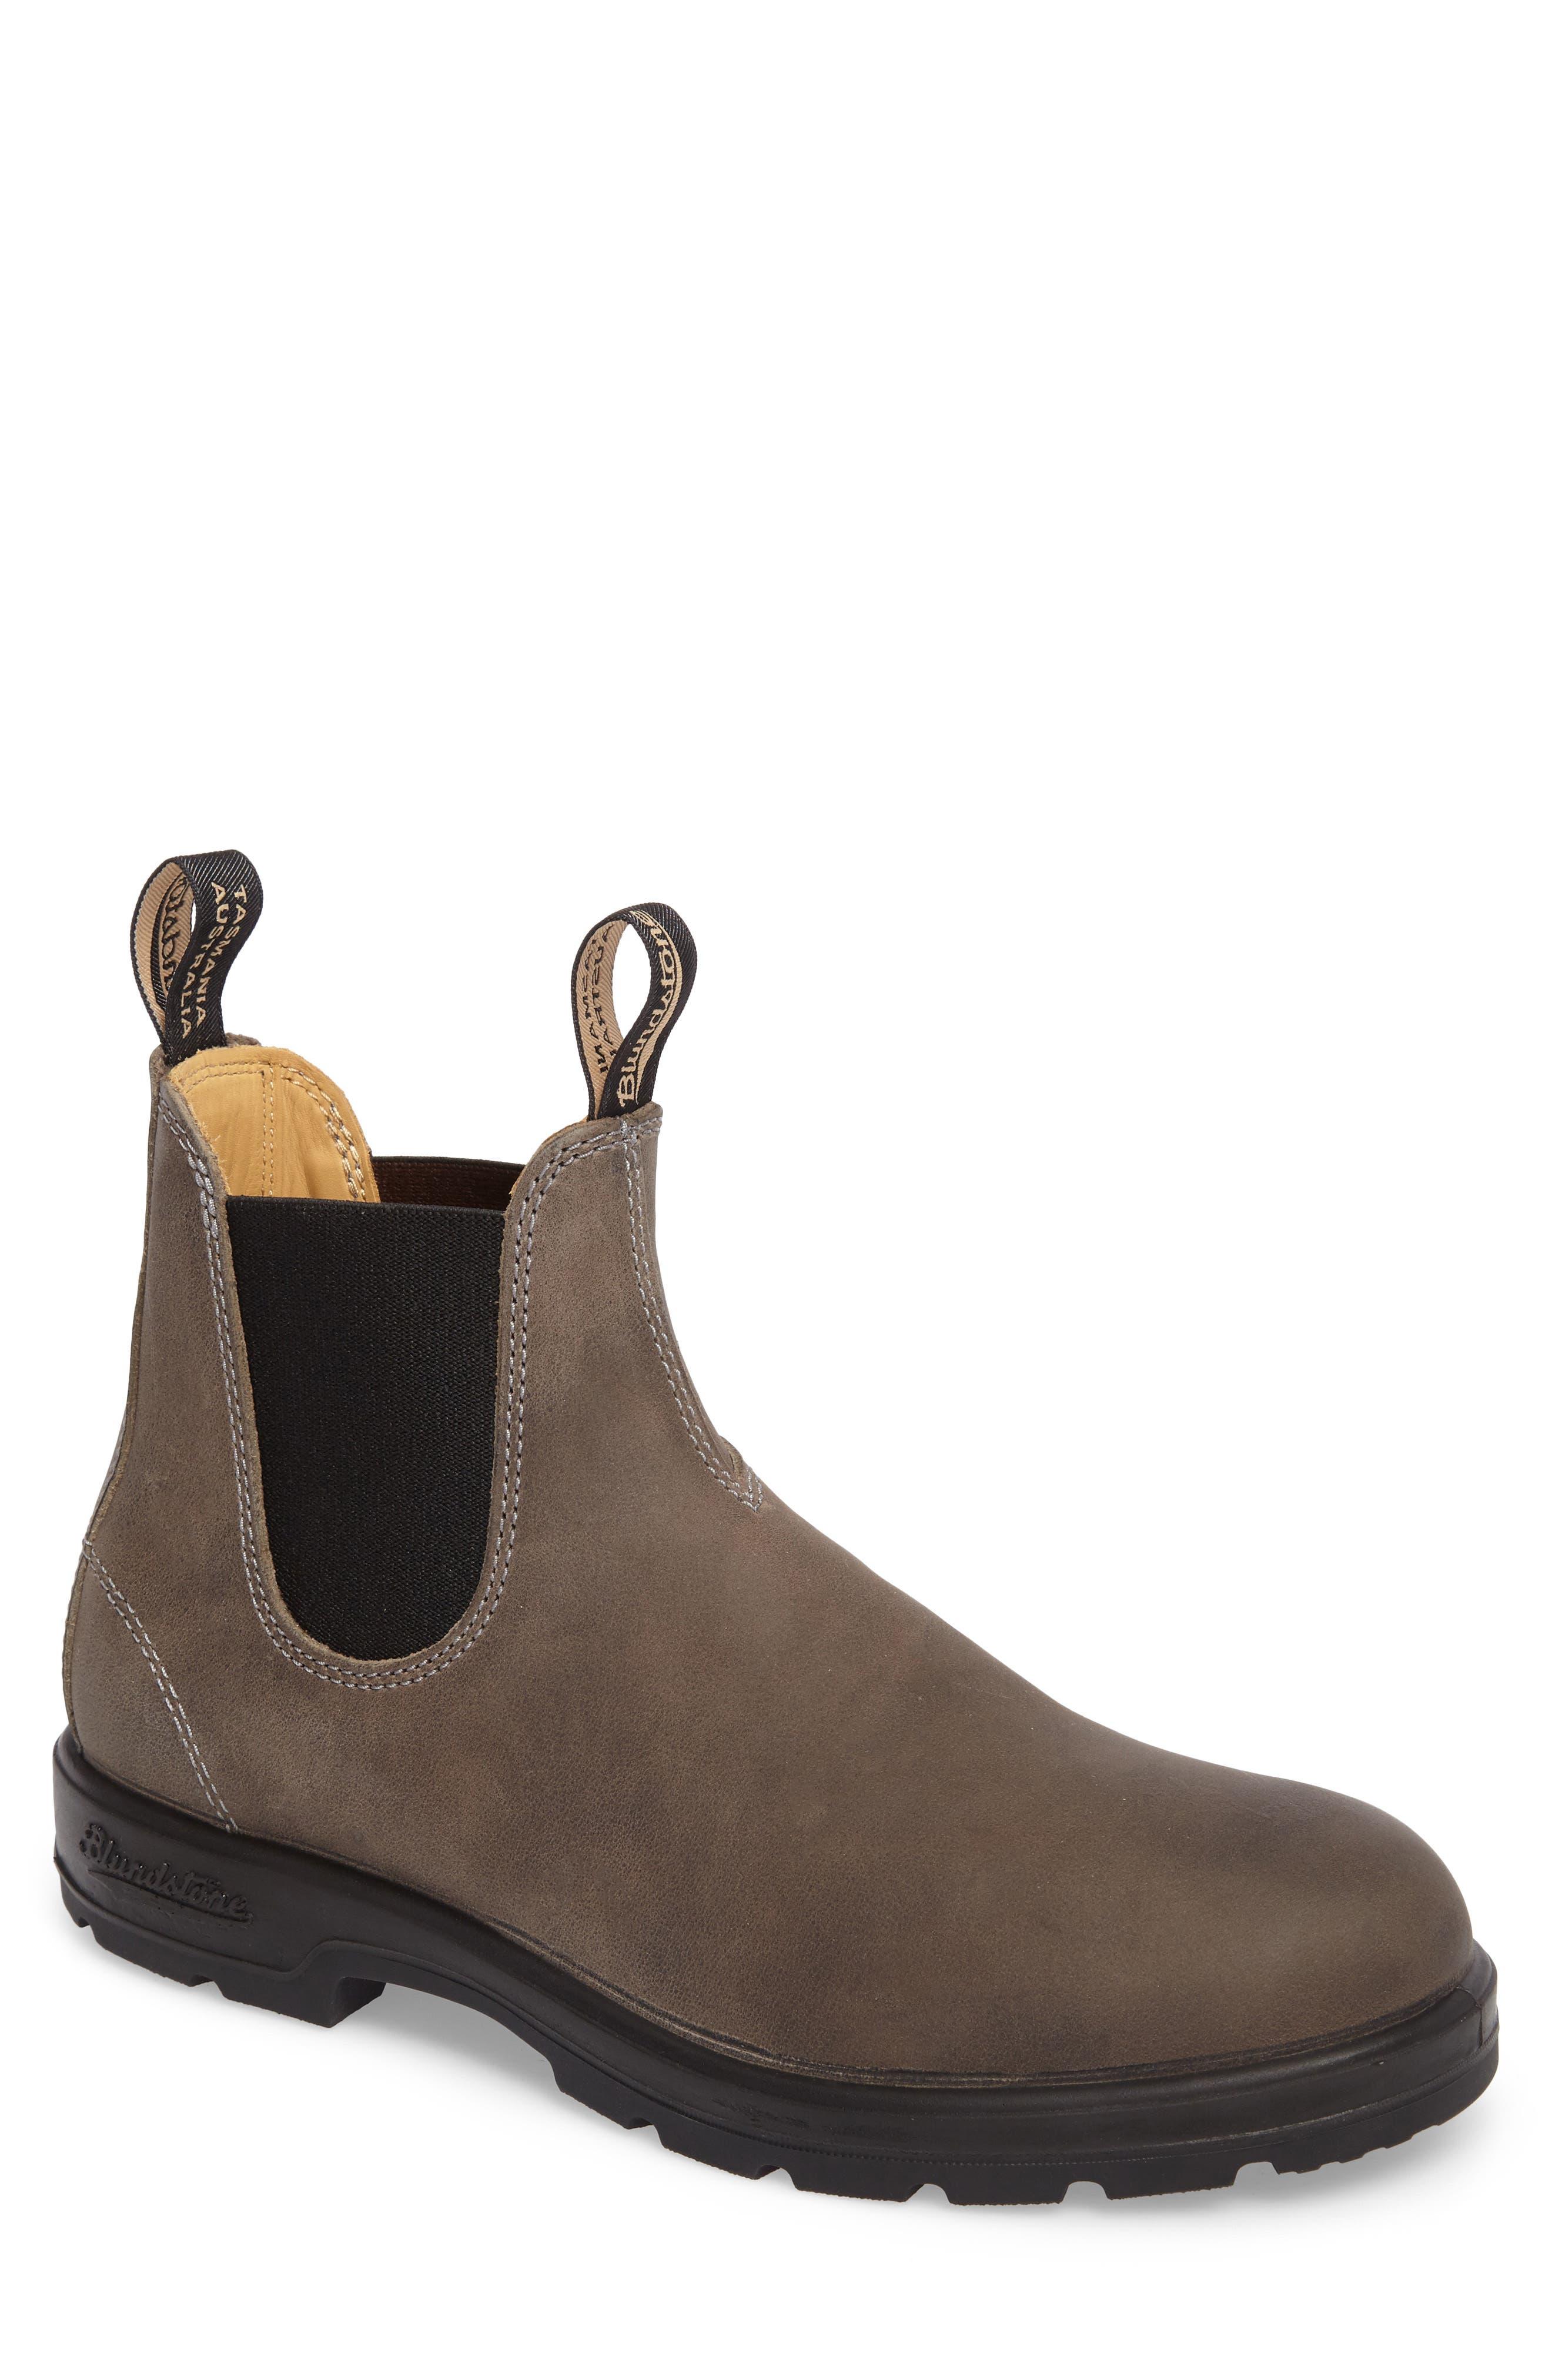 Main Image - Blundstone Footwear Chelsea Boot